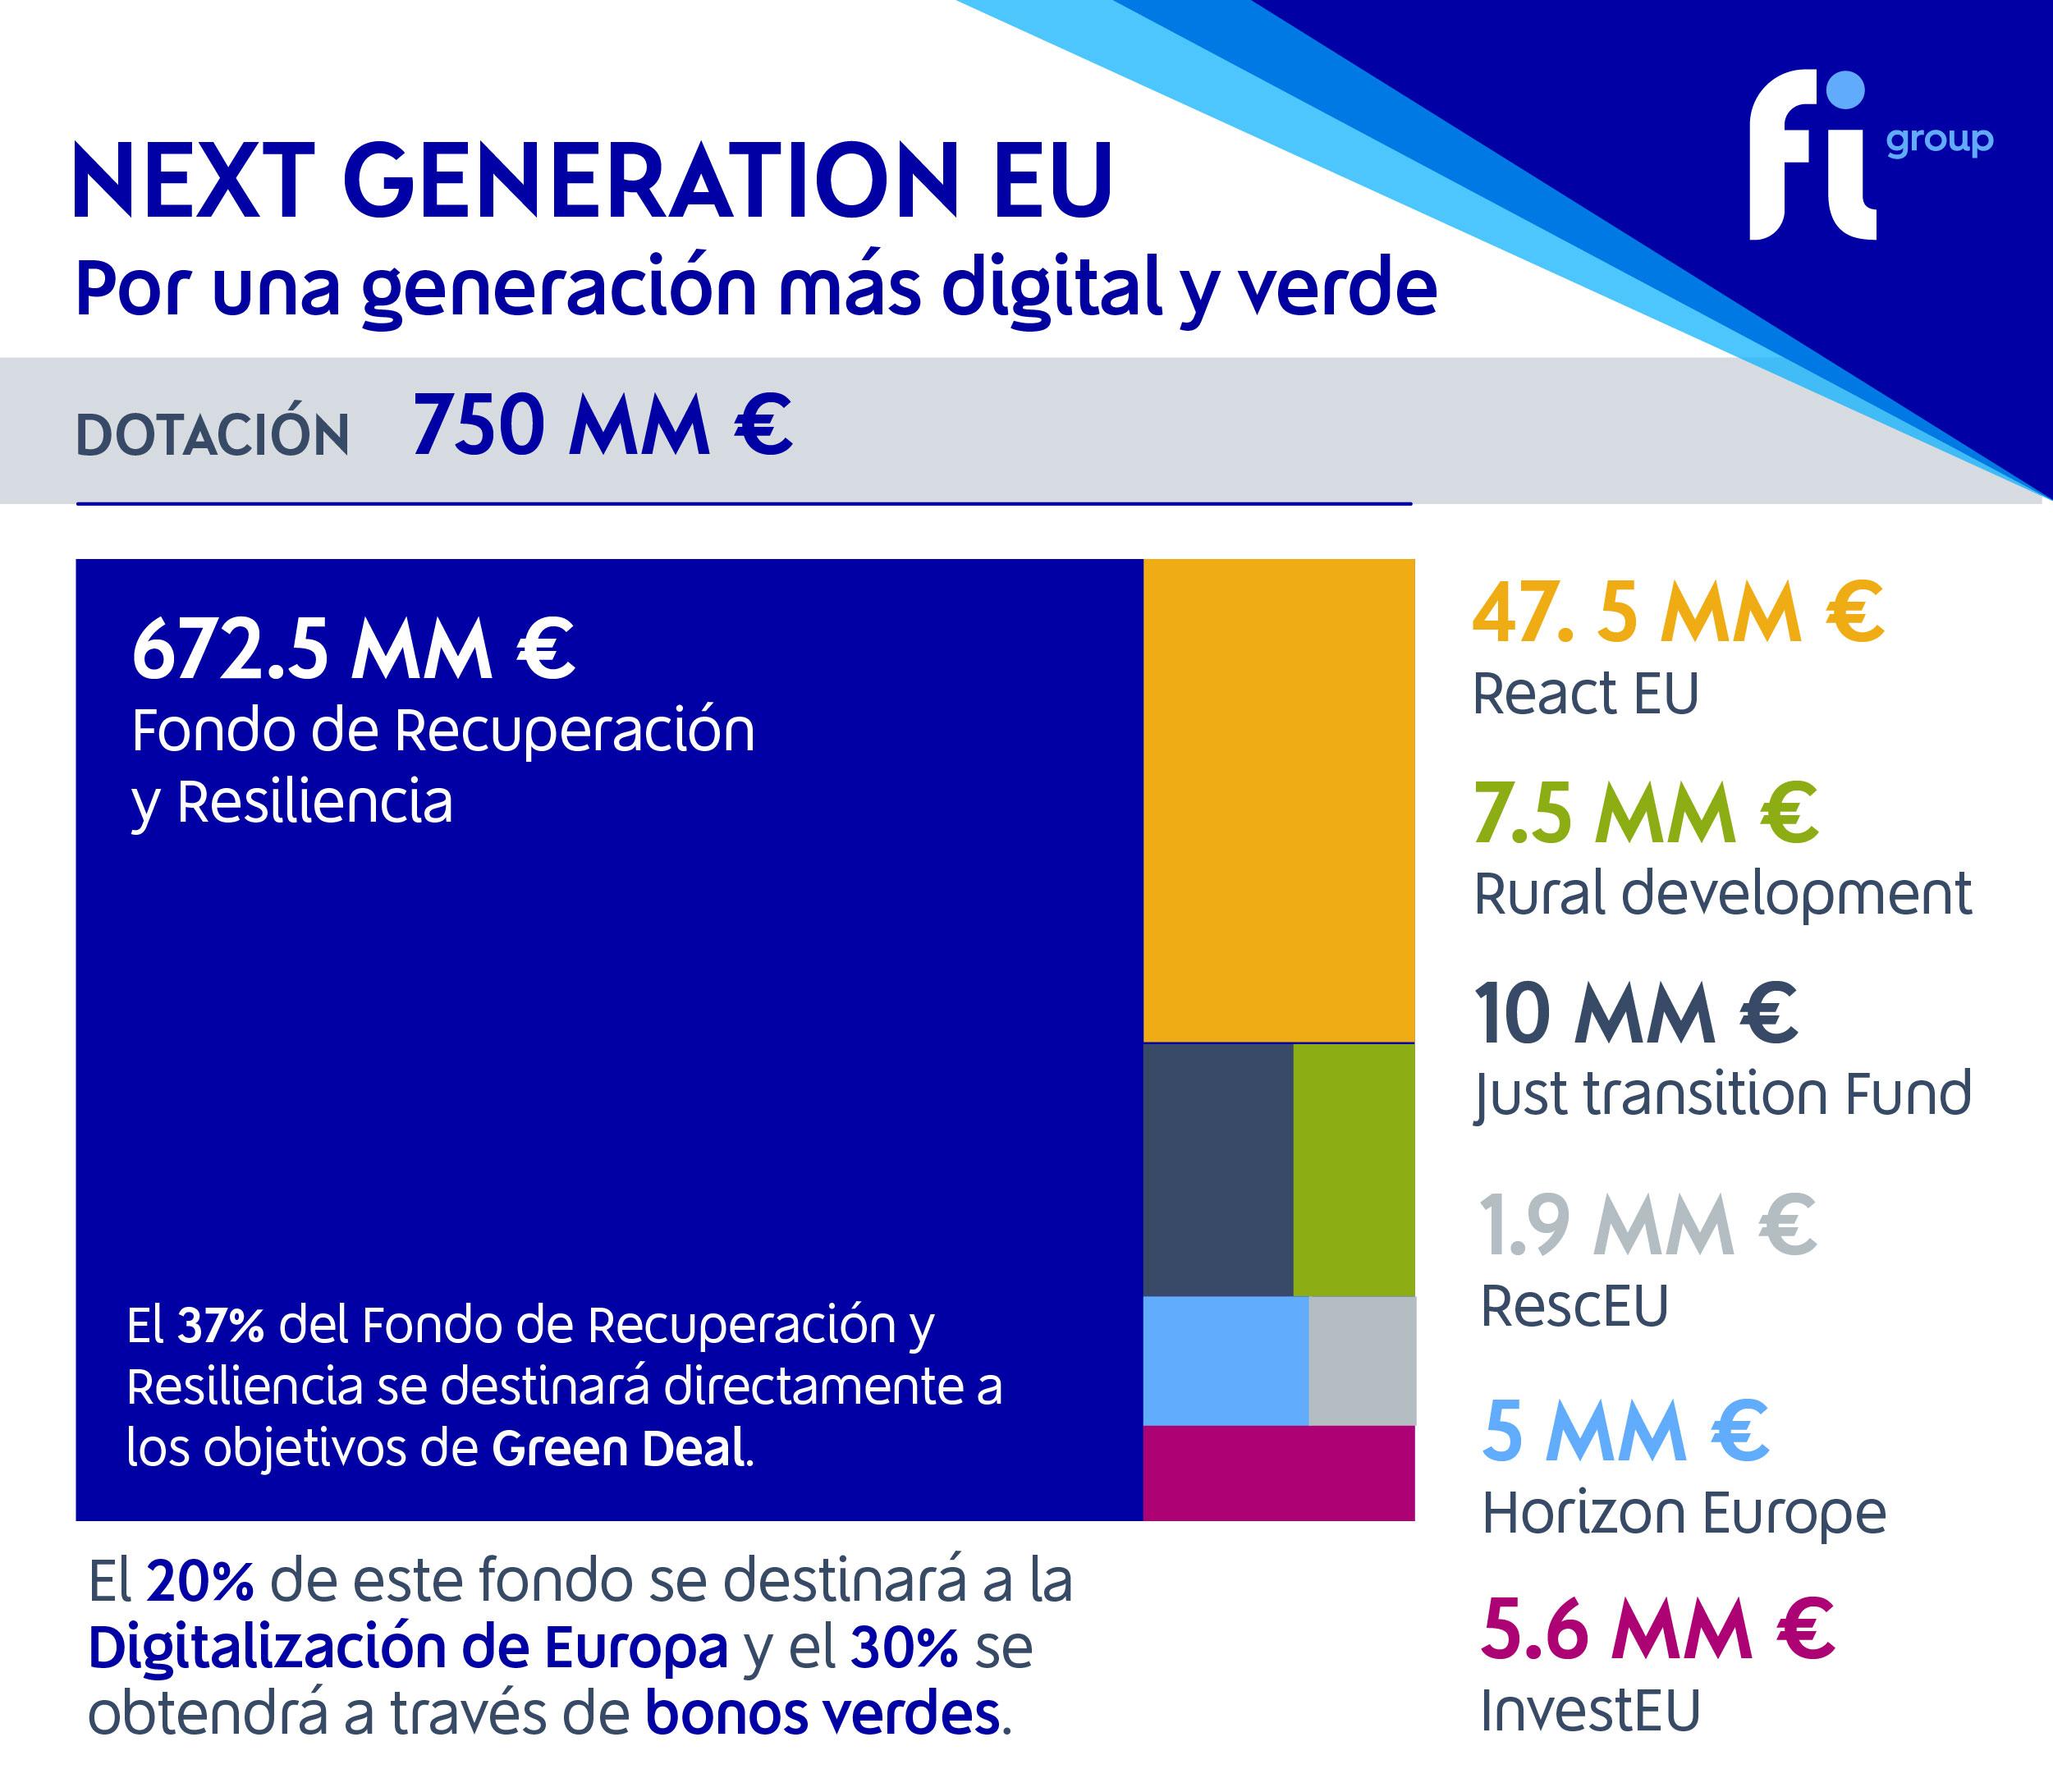 Ayuda europea NEXT Generation EU 750.000 millones euros